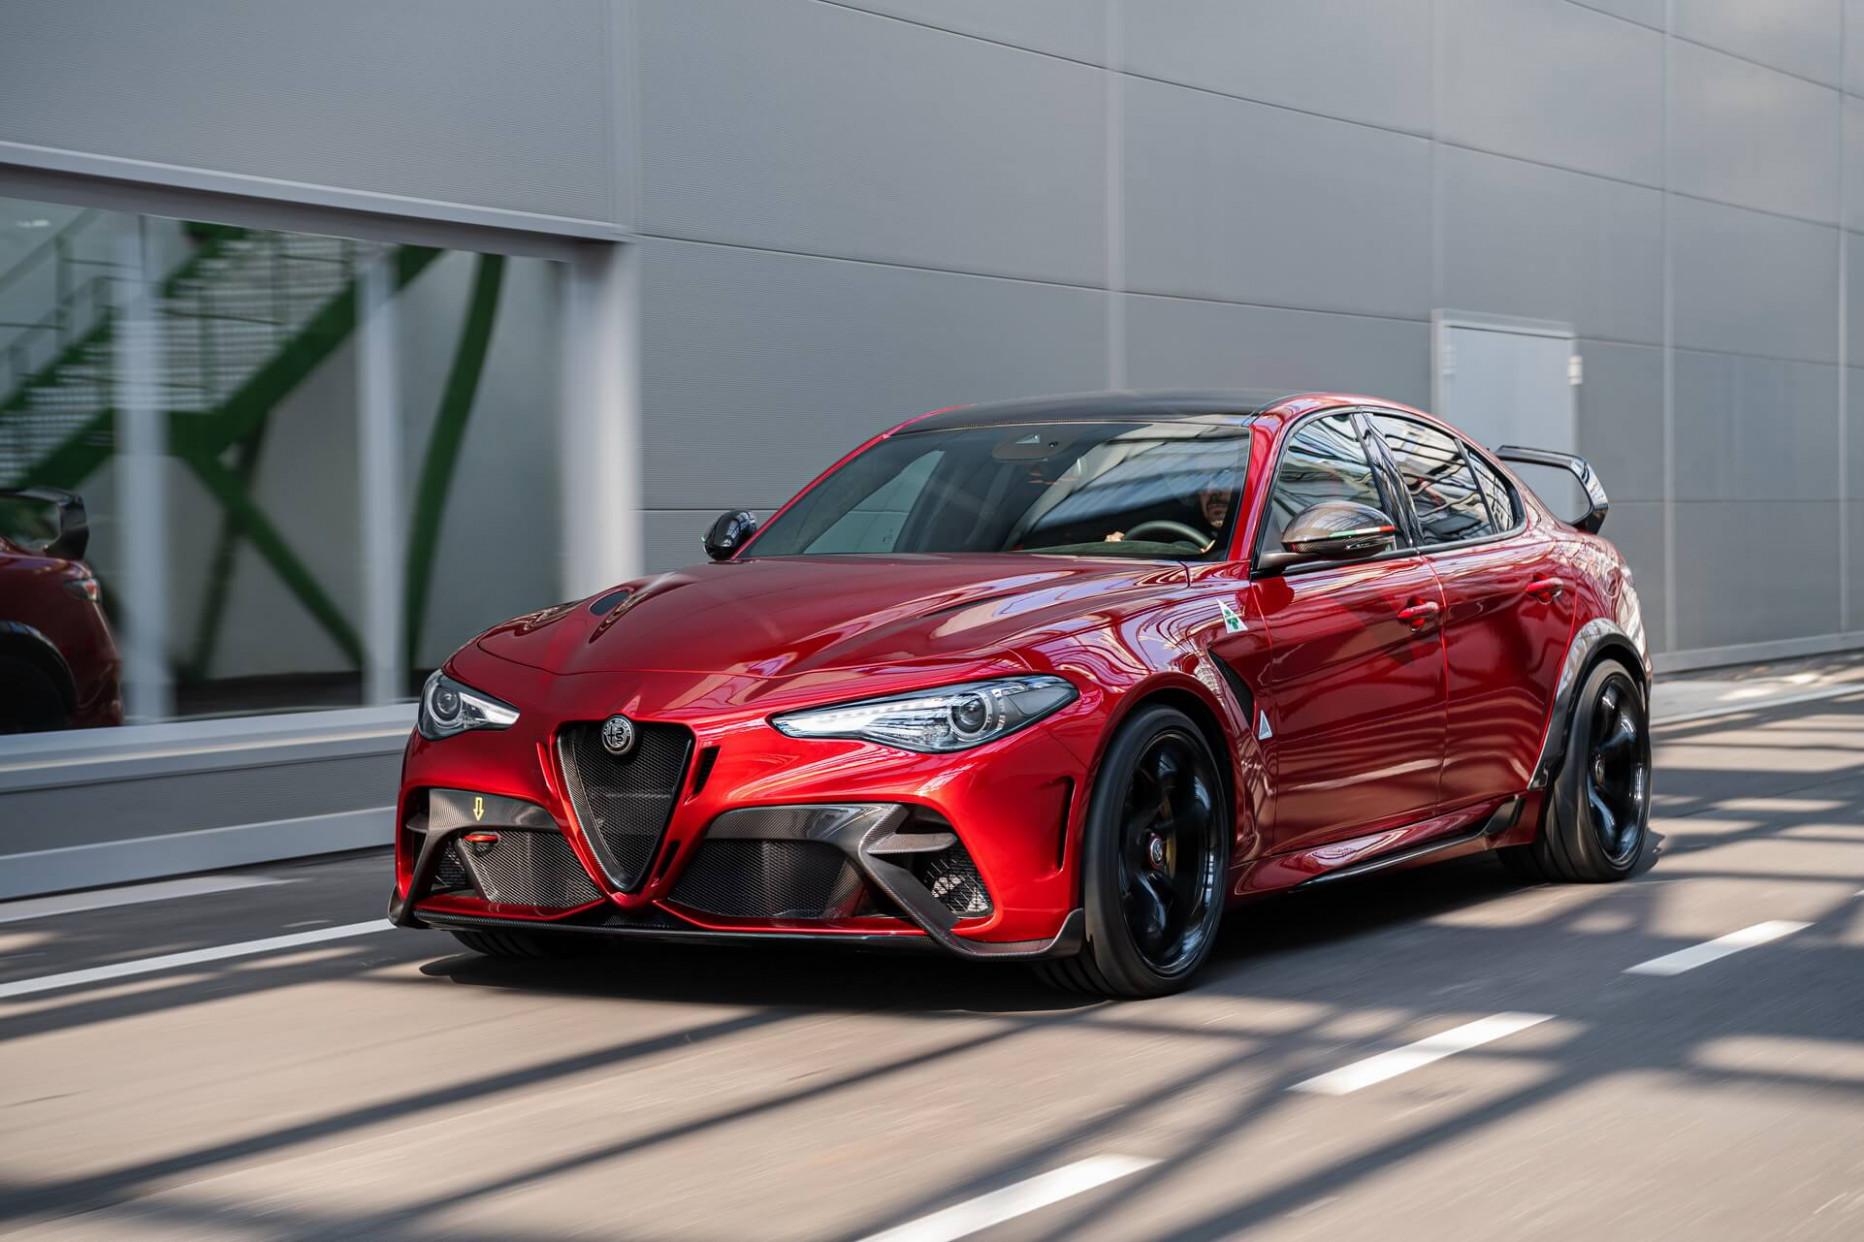 Exterior and Interior 2022 Alfa Romeo Giulia